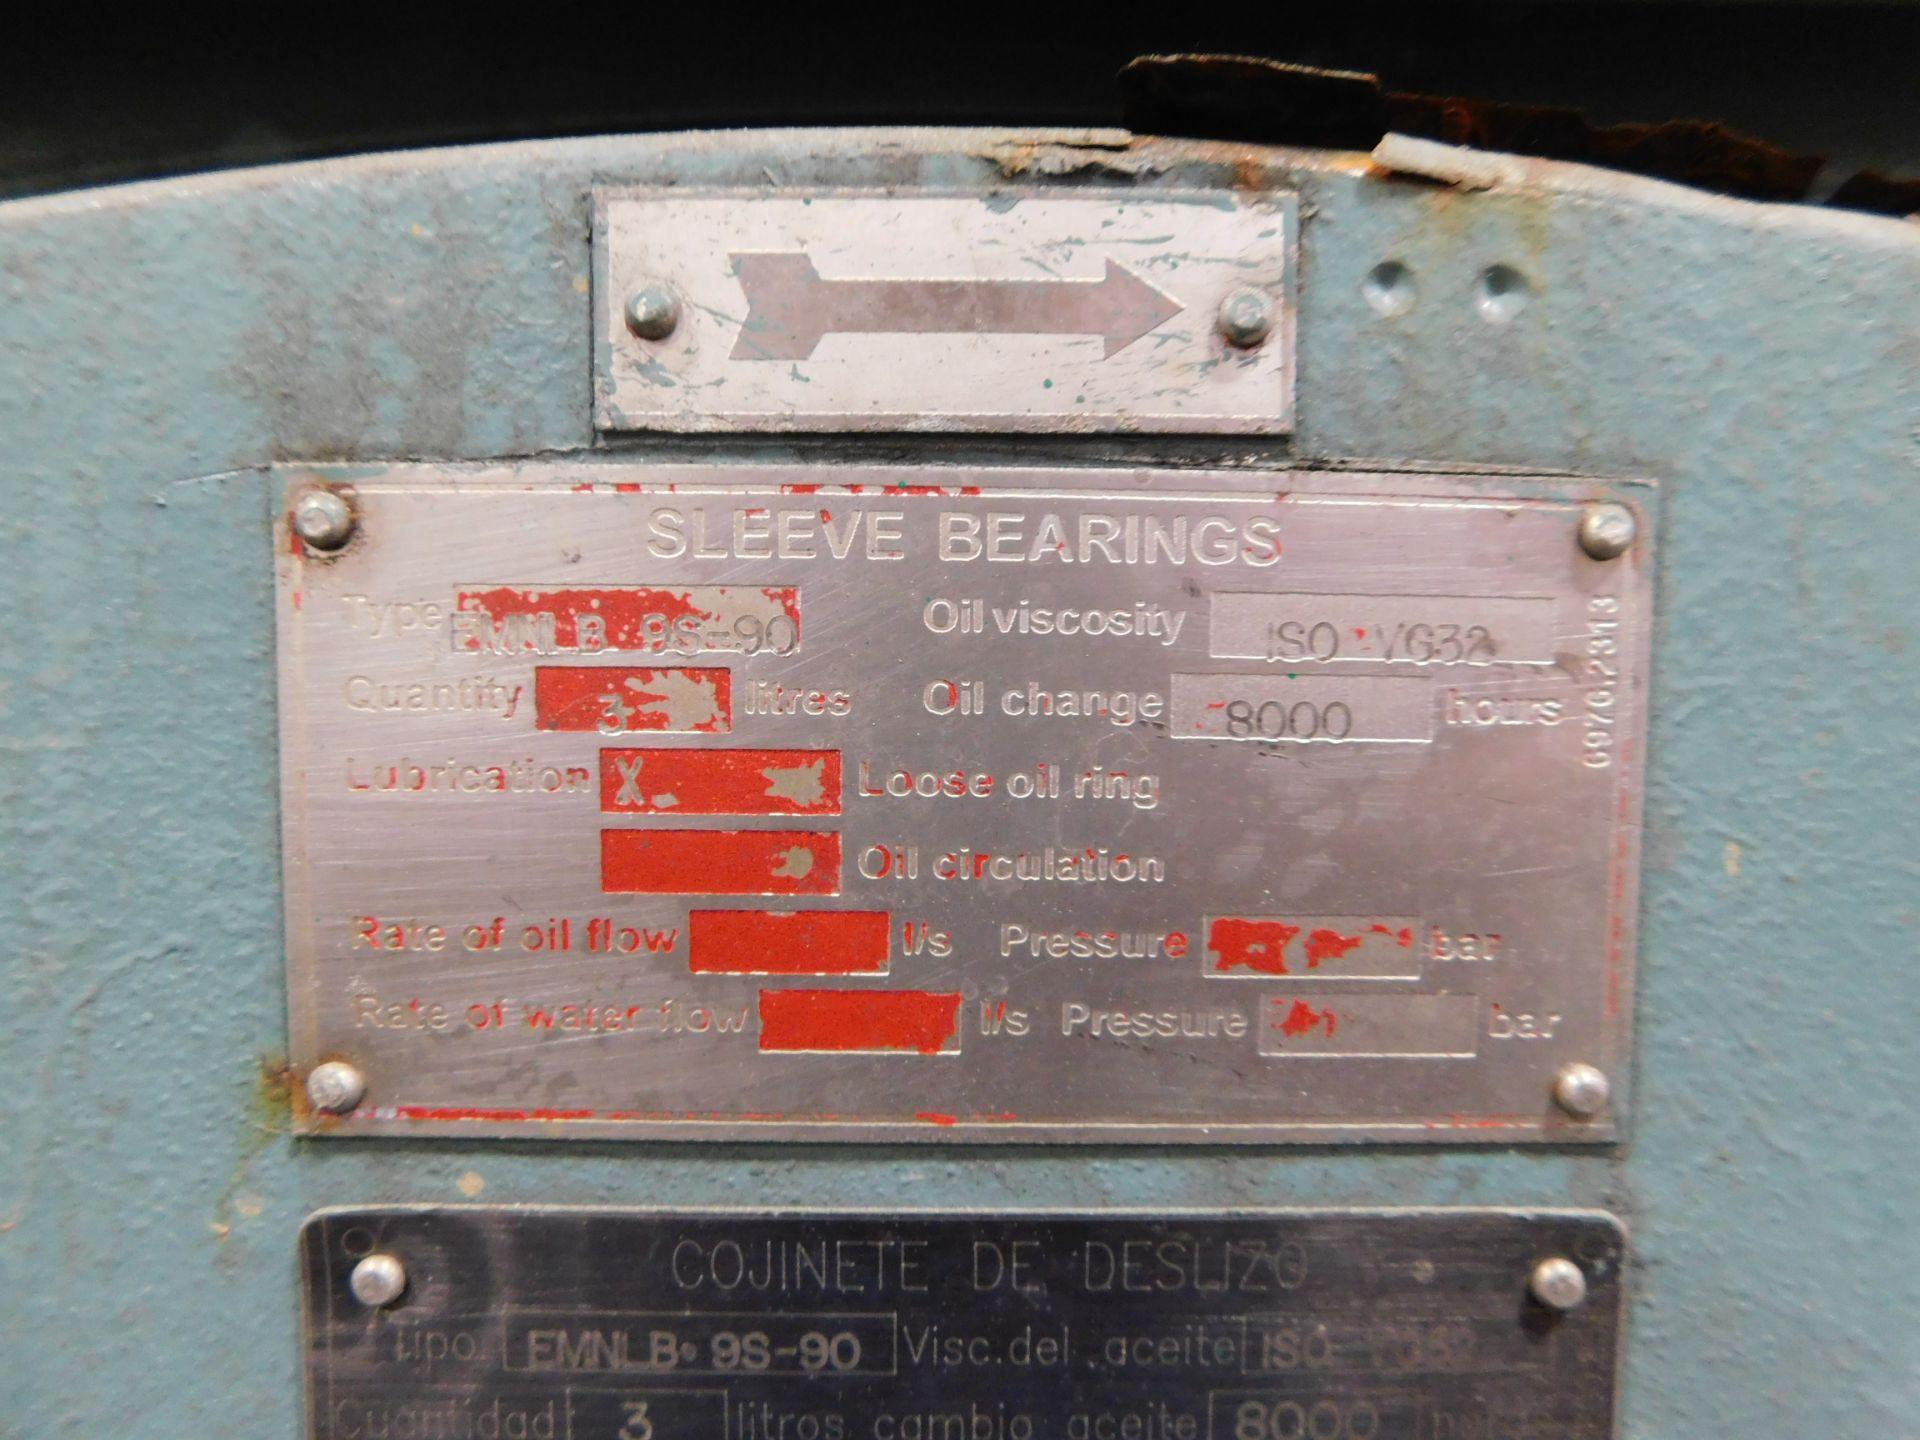 Weg Induction Motor. 2750 HP. 3 Ph. 4000 V. 3582 RPM. 1PW24. MGP 8011. 60 Hz. - Image 7 of 7